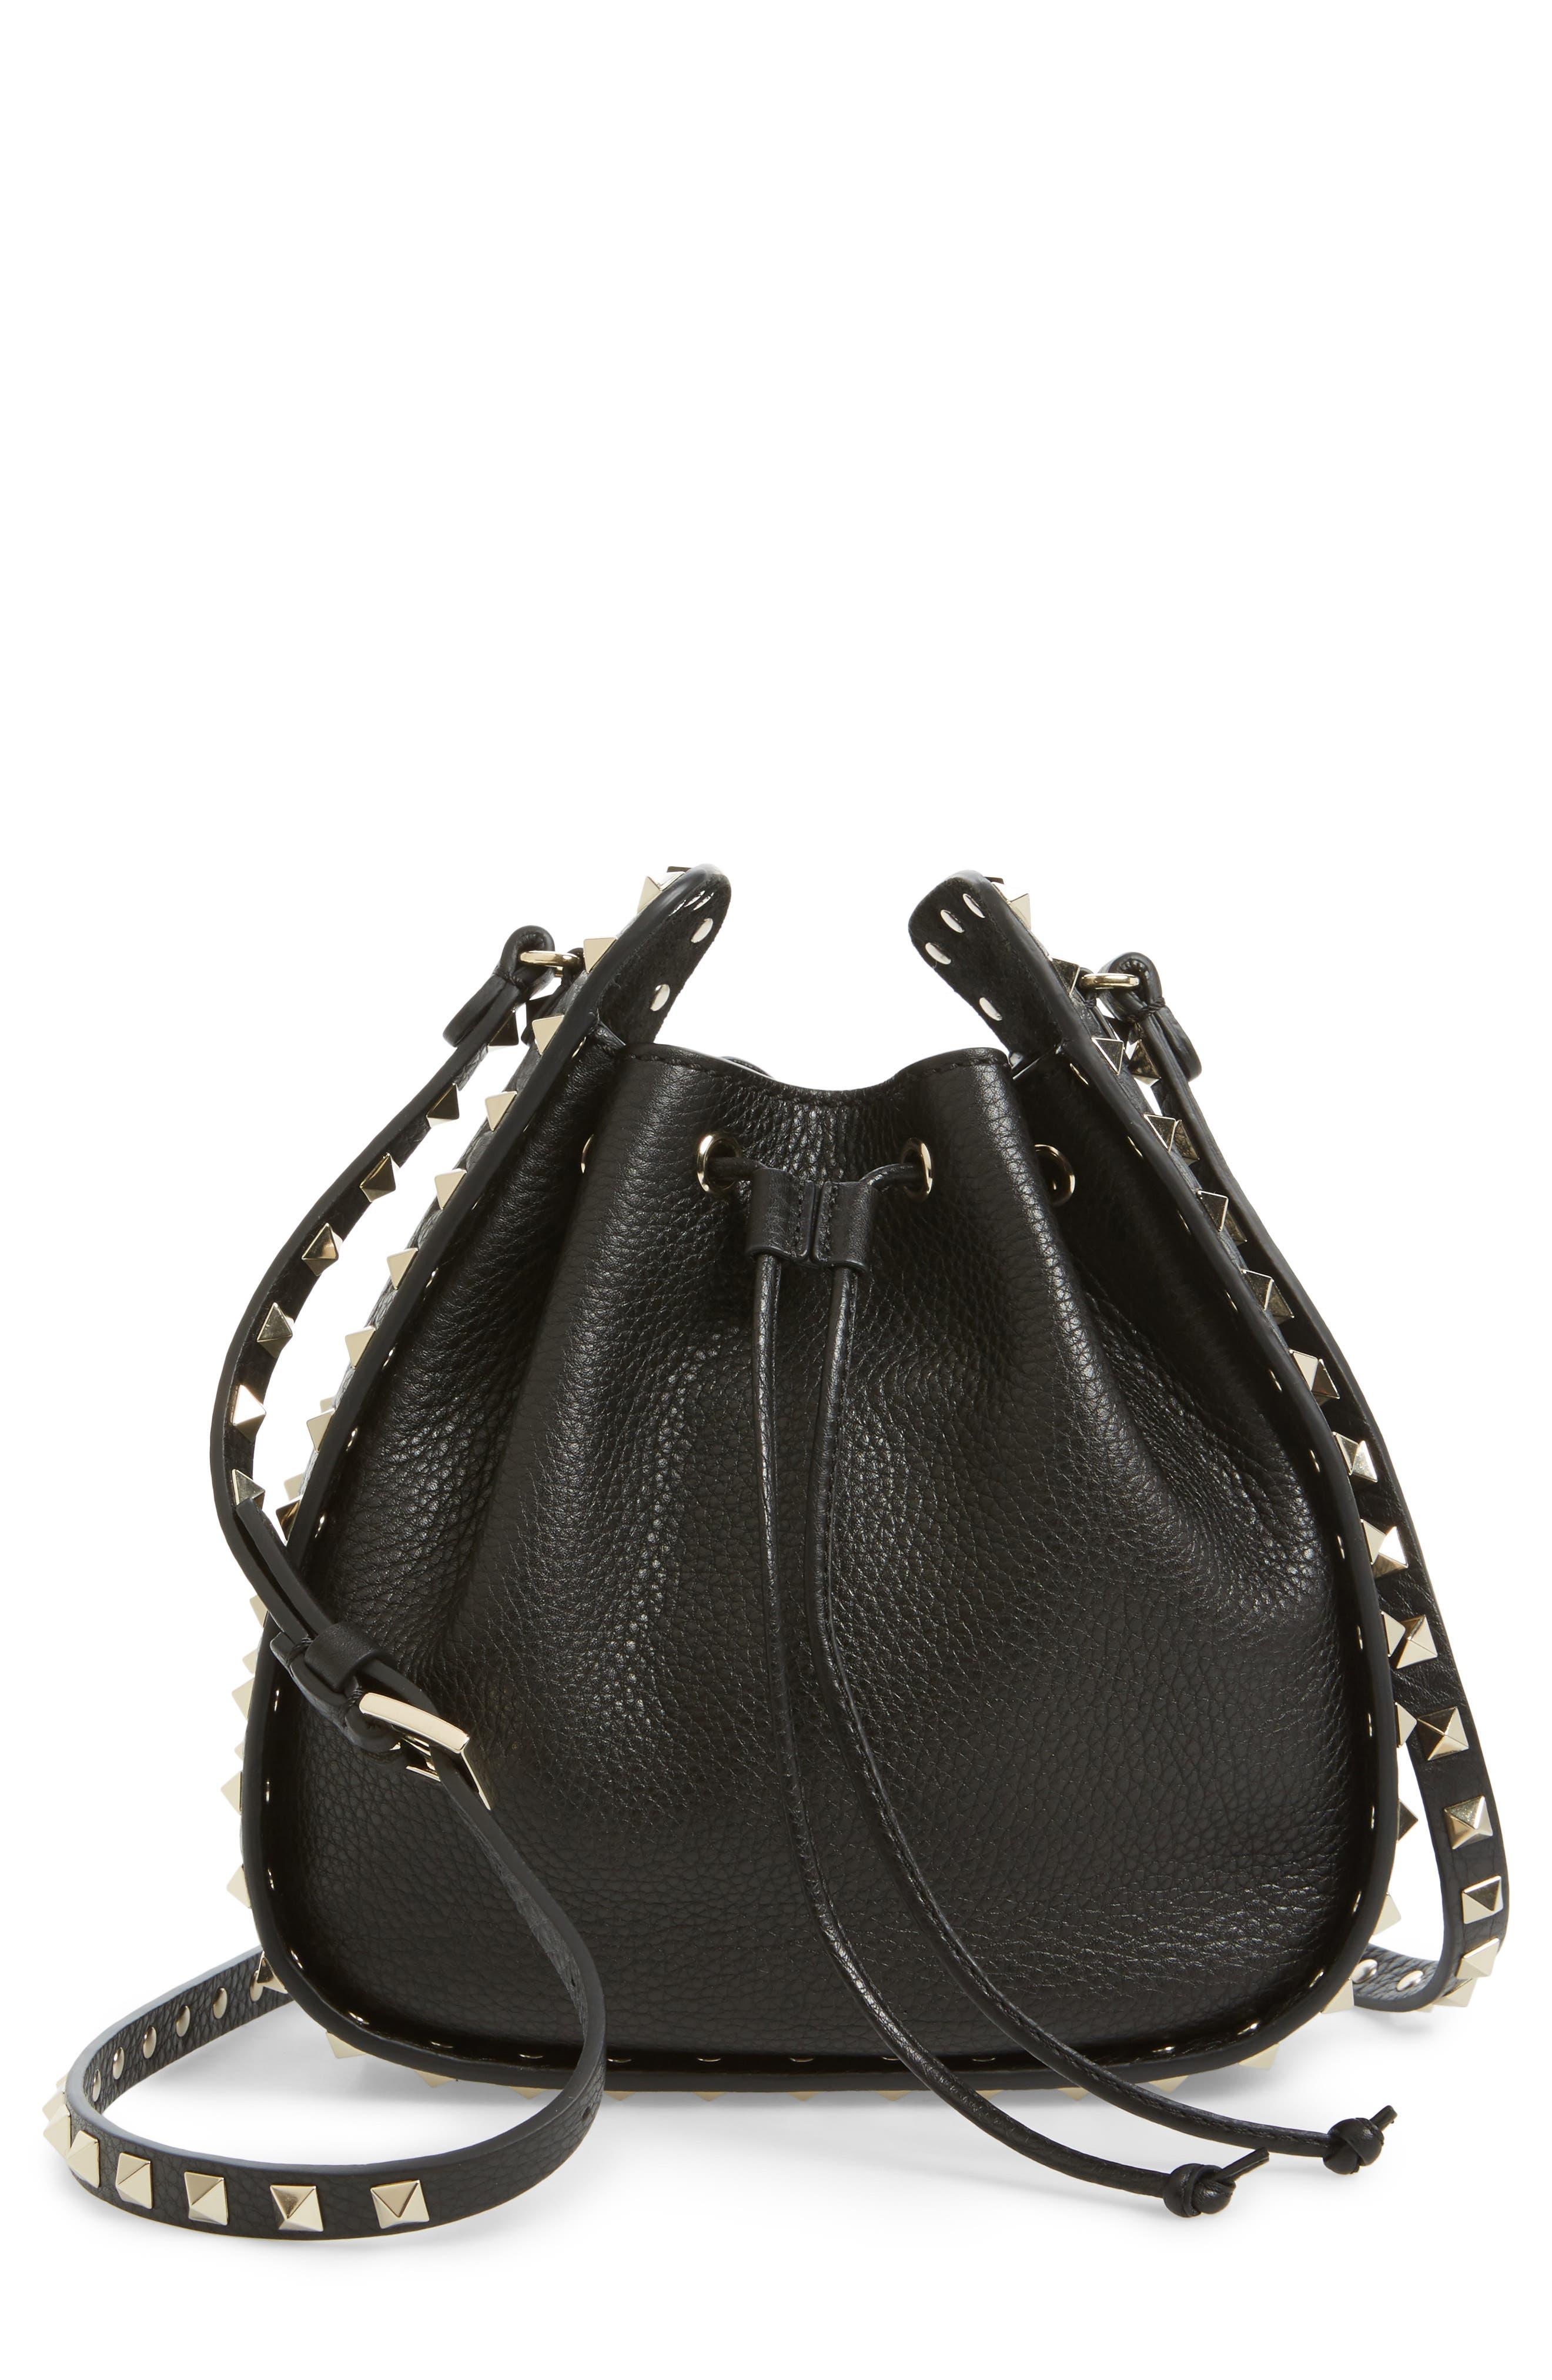 VALENTINO GARAVANI Rockstud Leather Bucket Bag, Main, color, 001